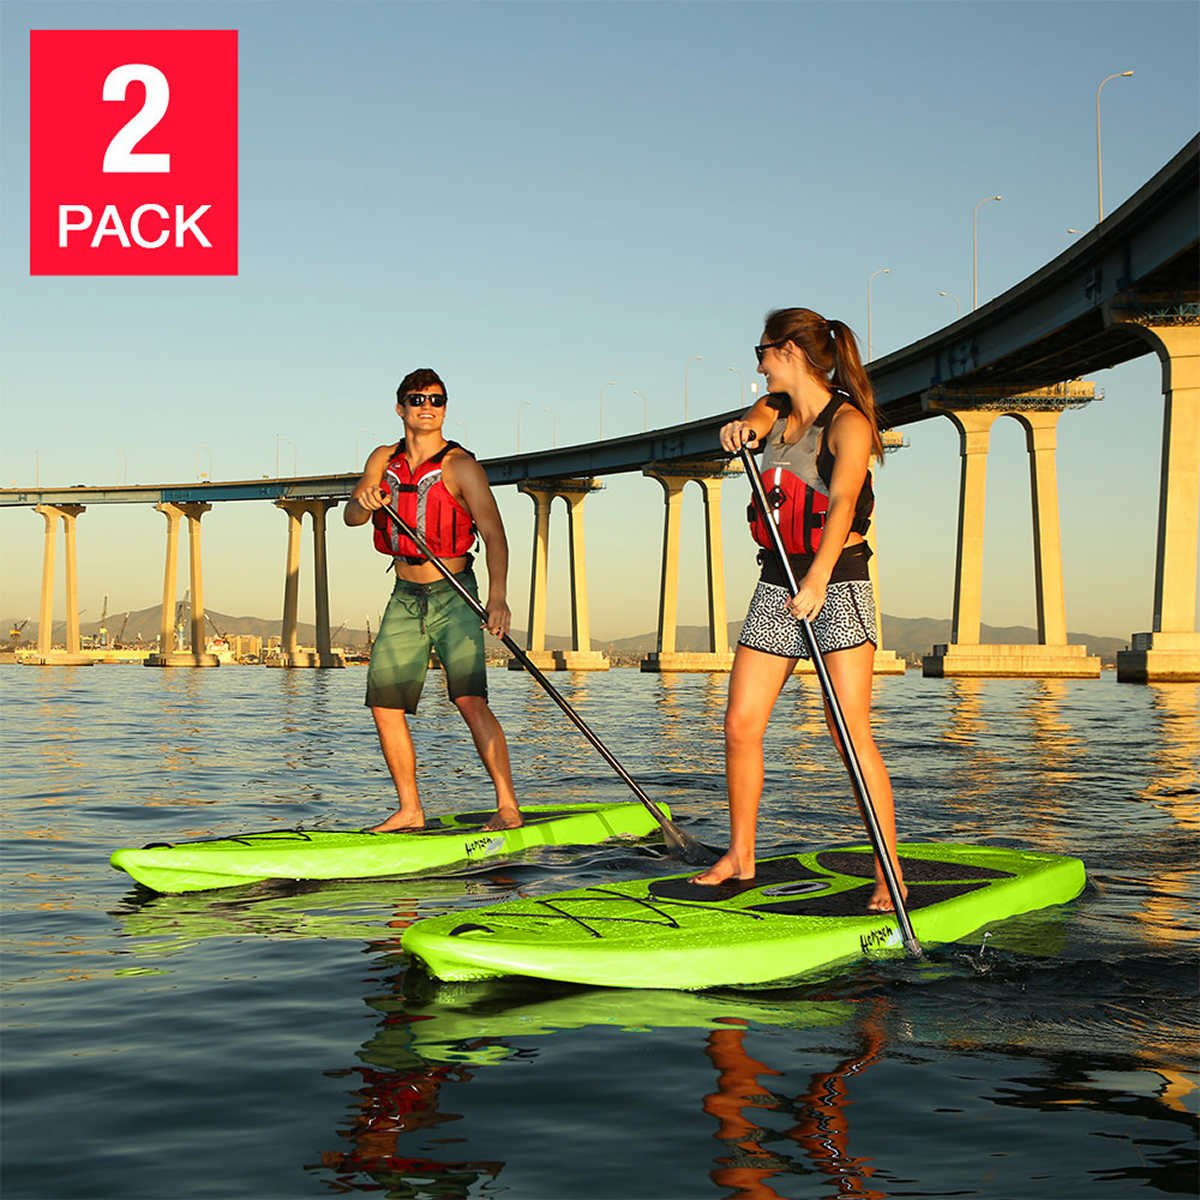 Lifetime 10 Hardshell Horizon Stand Up Paddle Board 2-pack